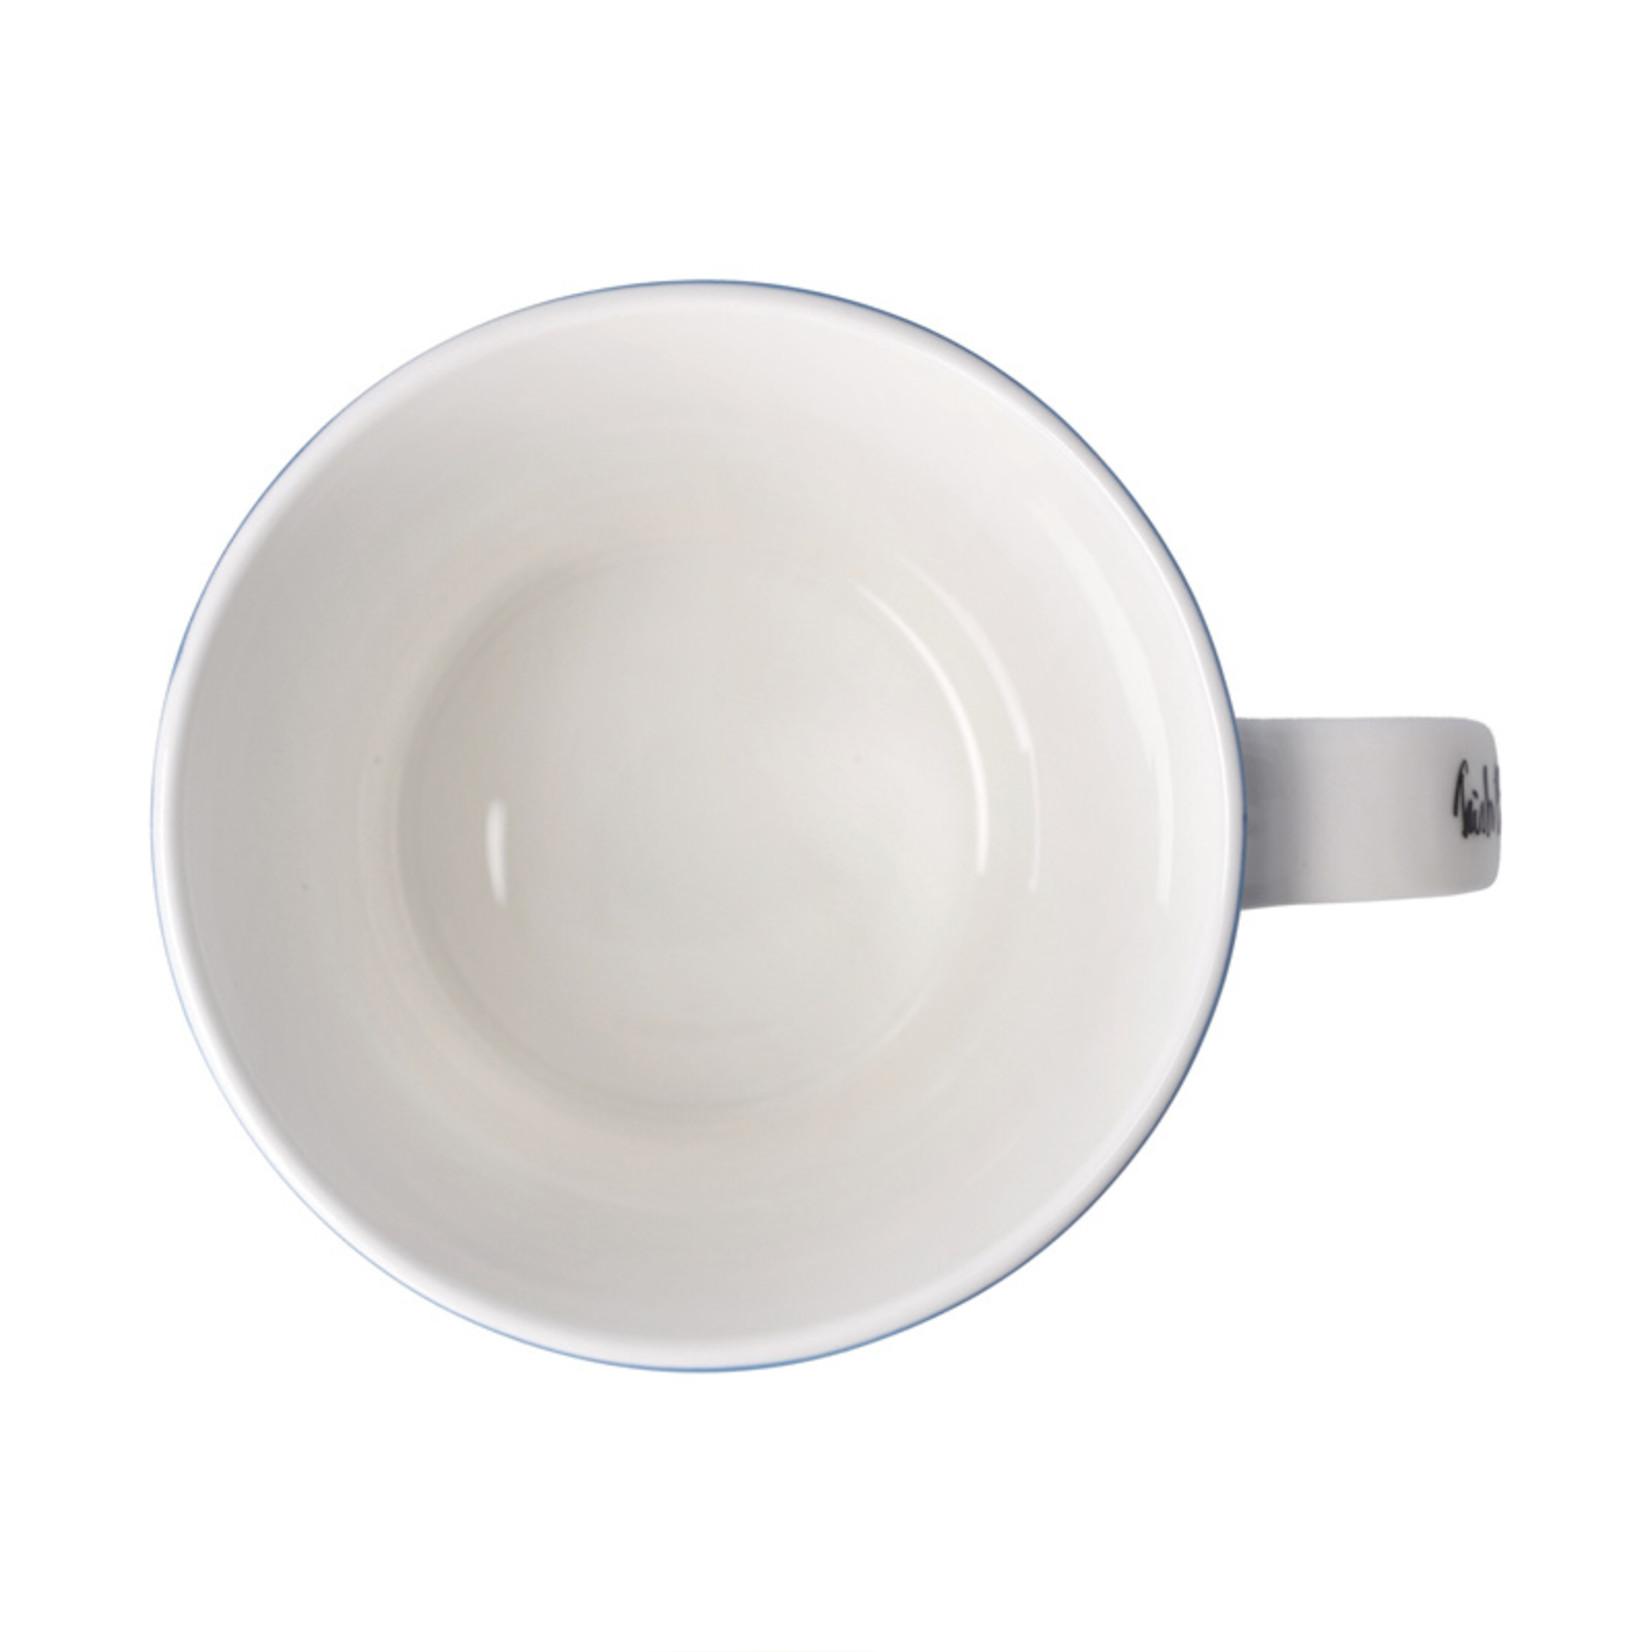 Goebel Porzellanmanufaktur Tasse Margarita Girl | Trish Biddle | Goebel Porzellan